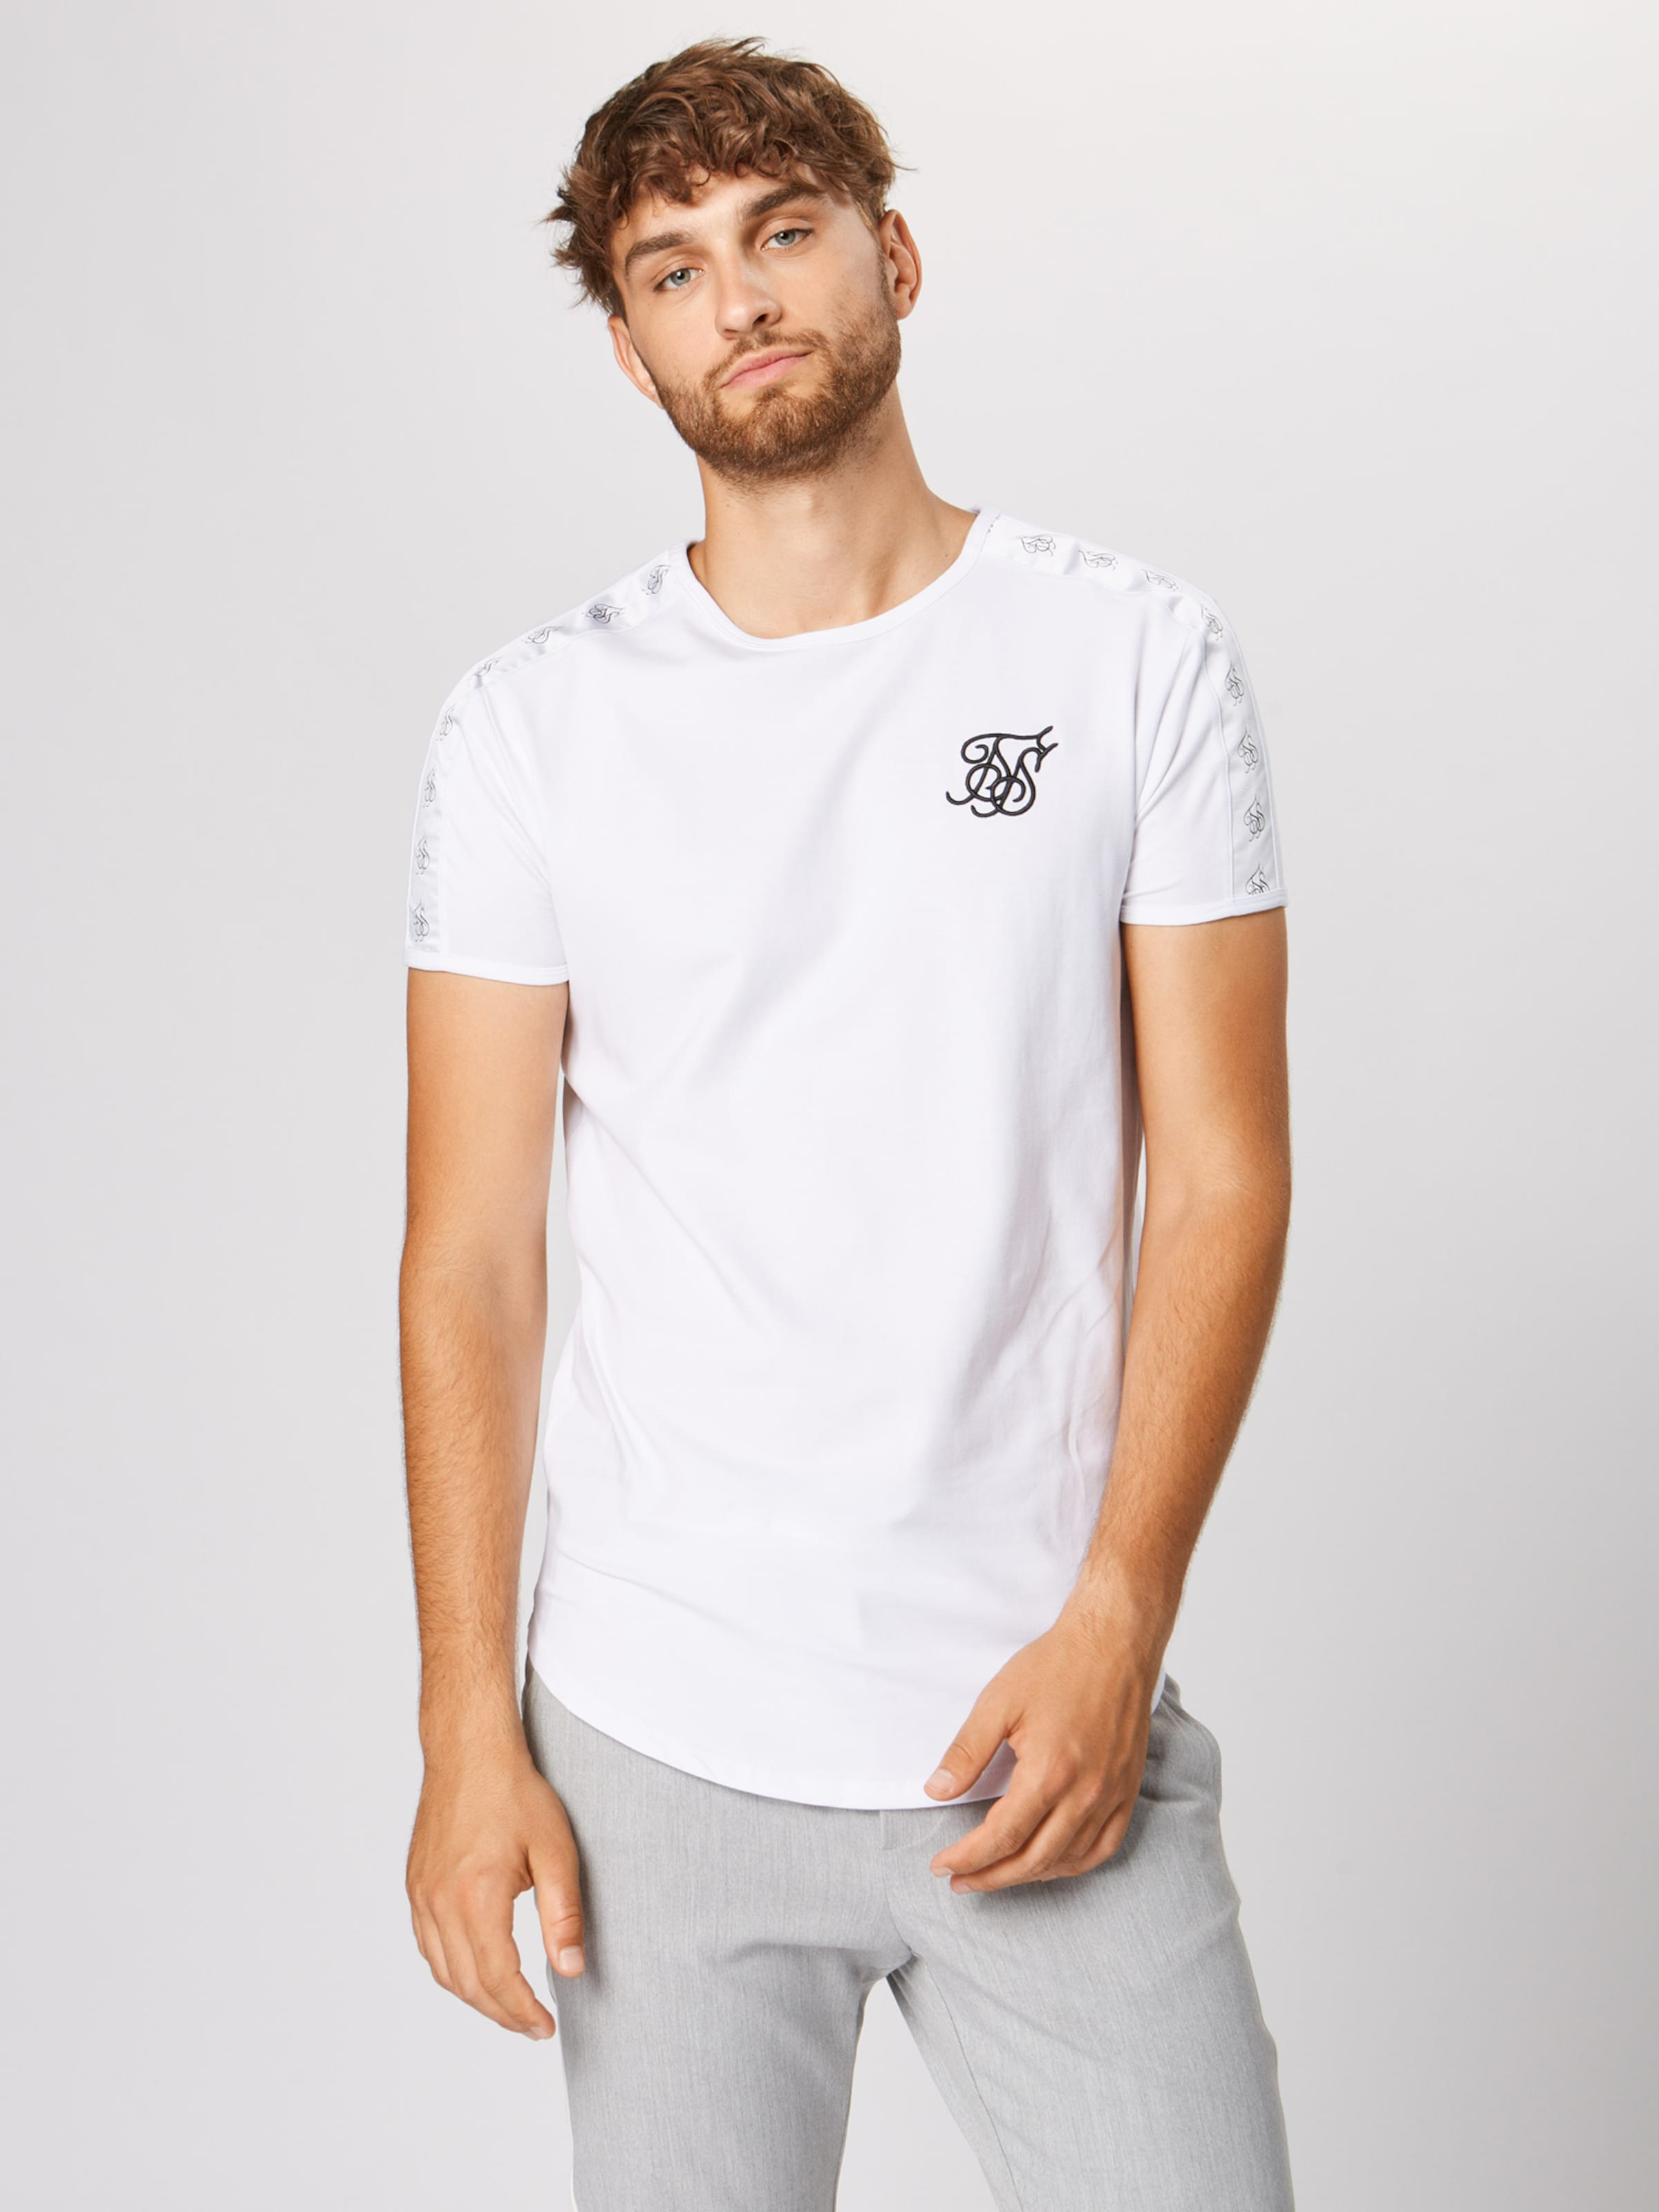 Weiß Weiß In Shirt Siksilk Siksilk Siksilk Shirt Siksilk Shirt In Shirt Weiß In In HWEIDY92